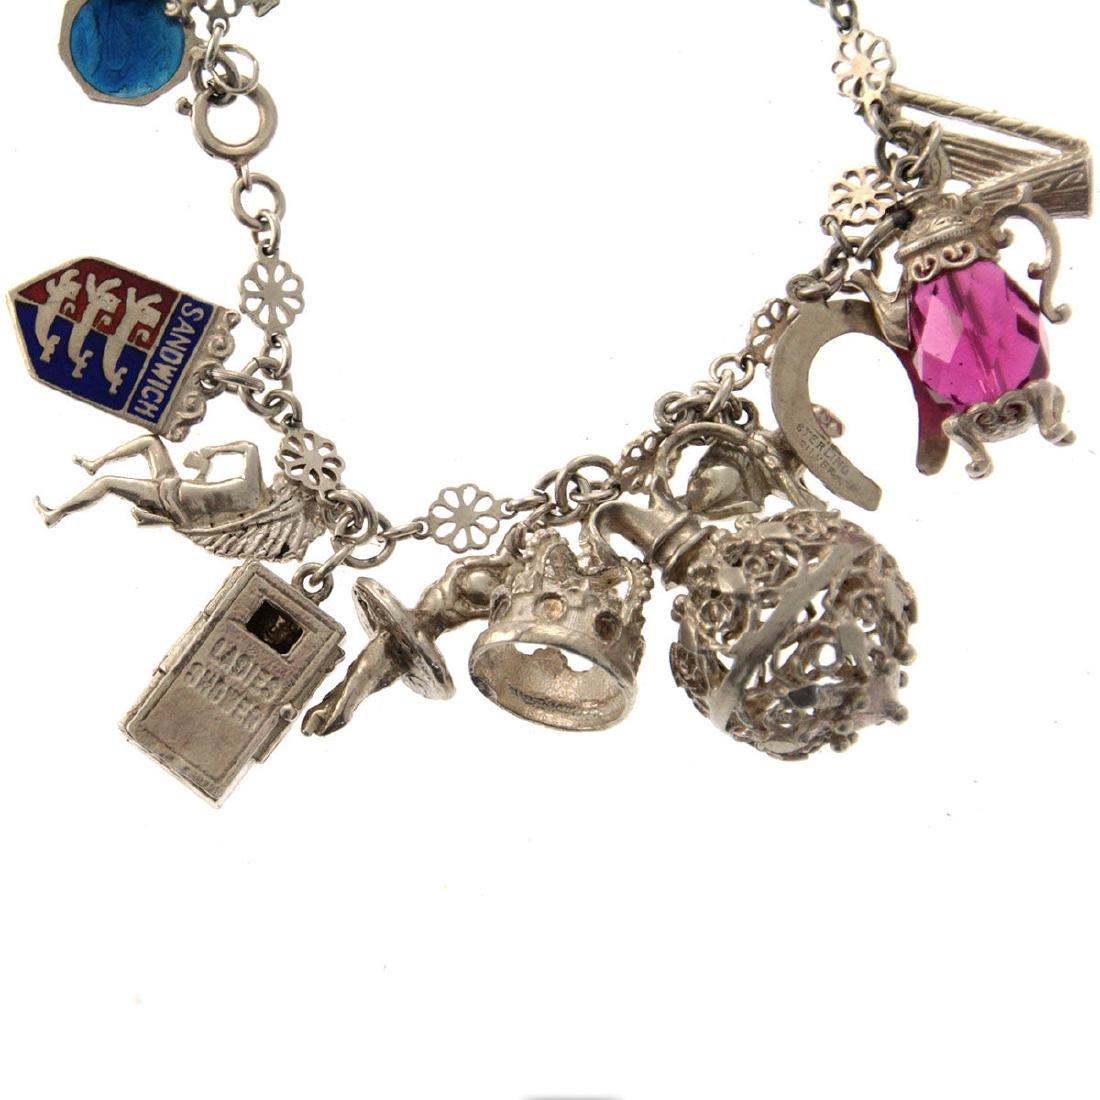 Sterling Silver Charm Bracelet. - 2